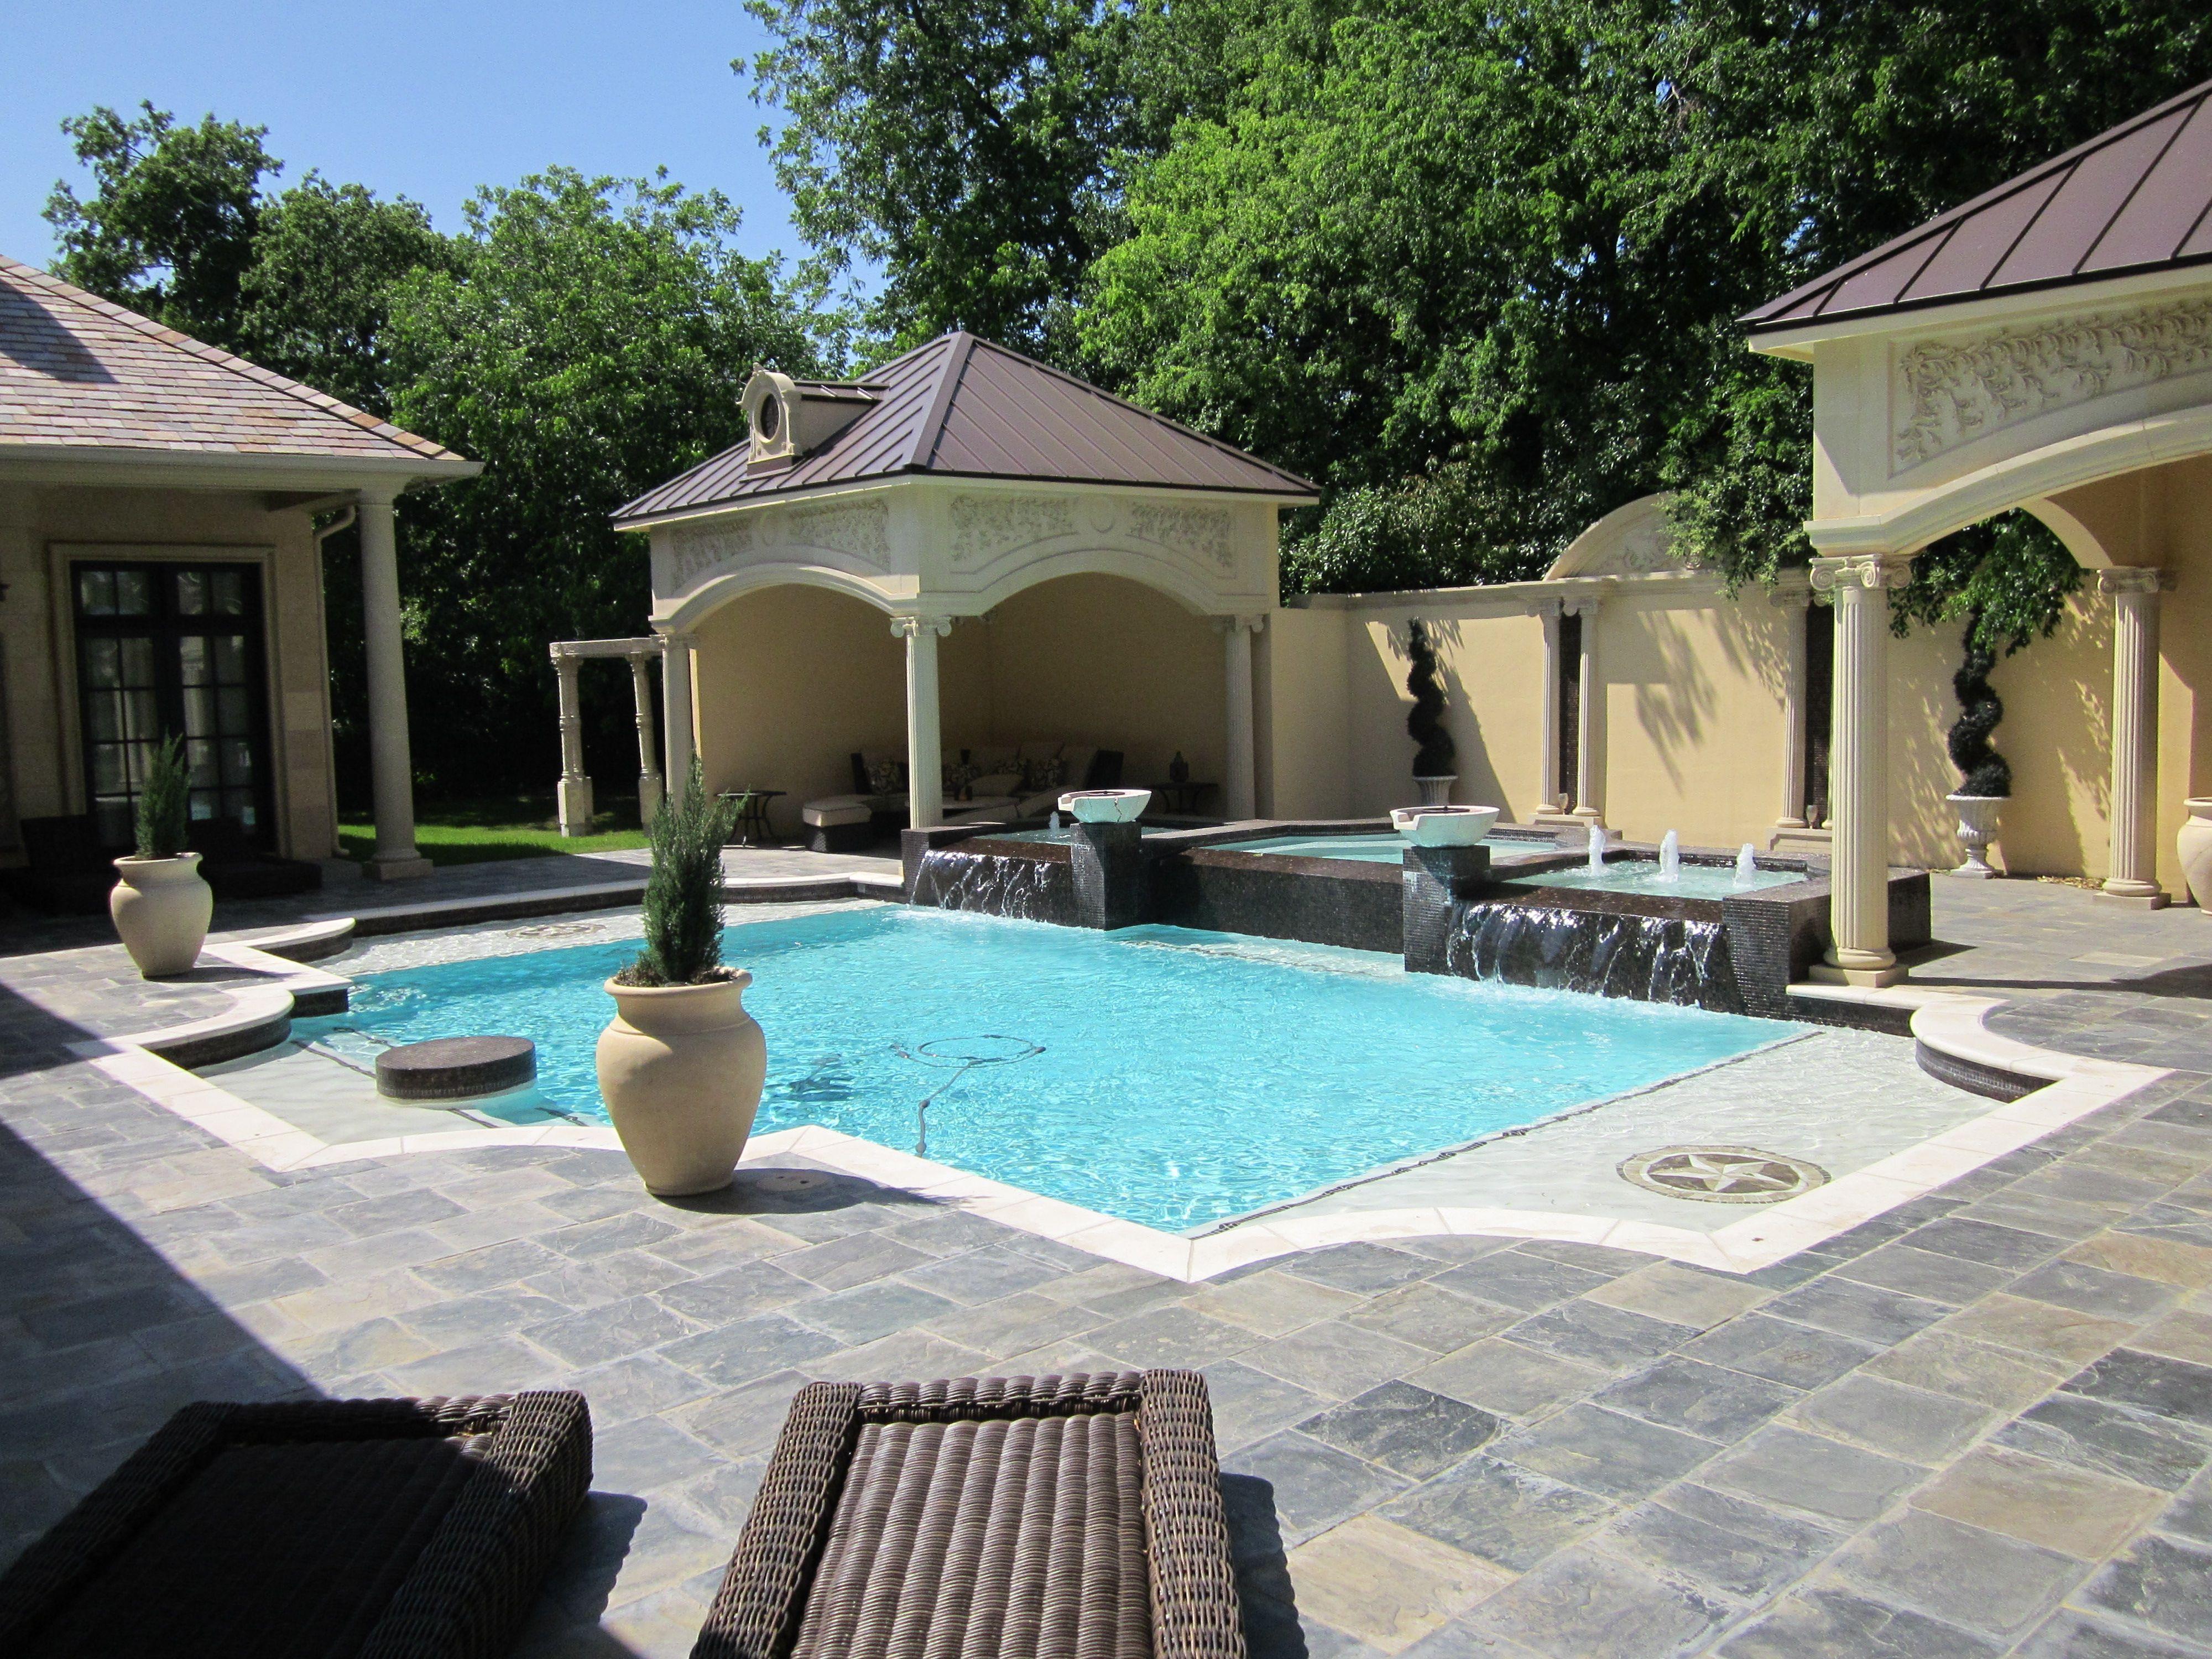 Roman Style Hobert Pool And Spa In Preston Hollow Pool